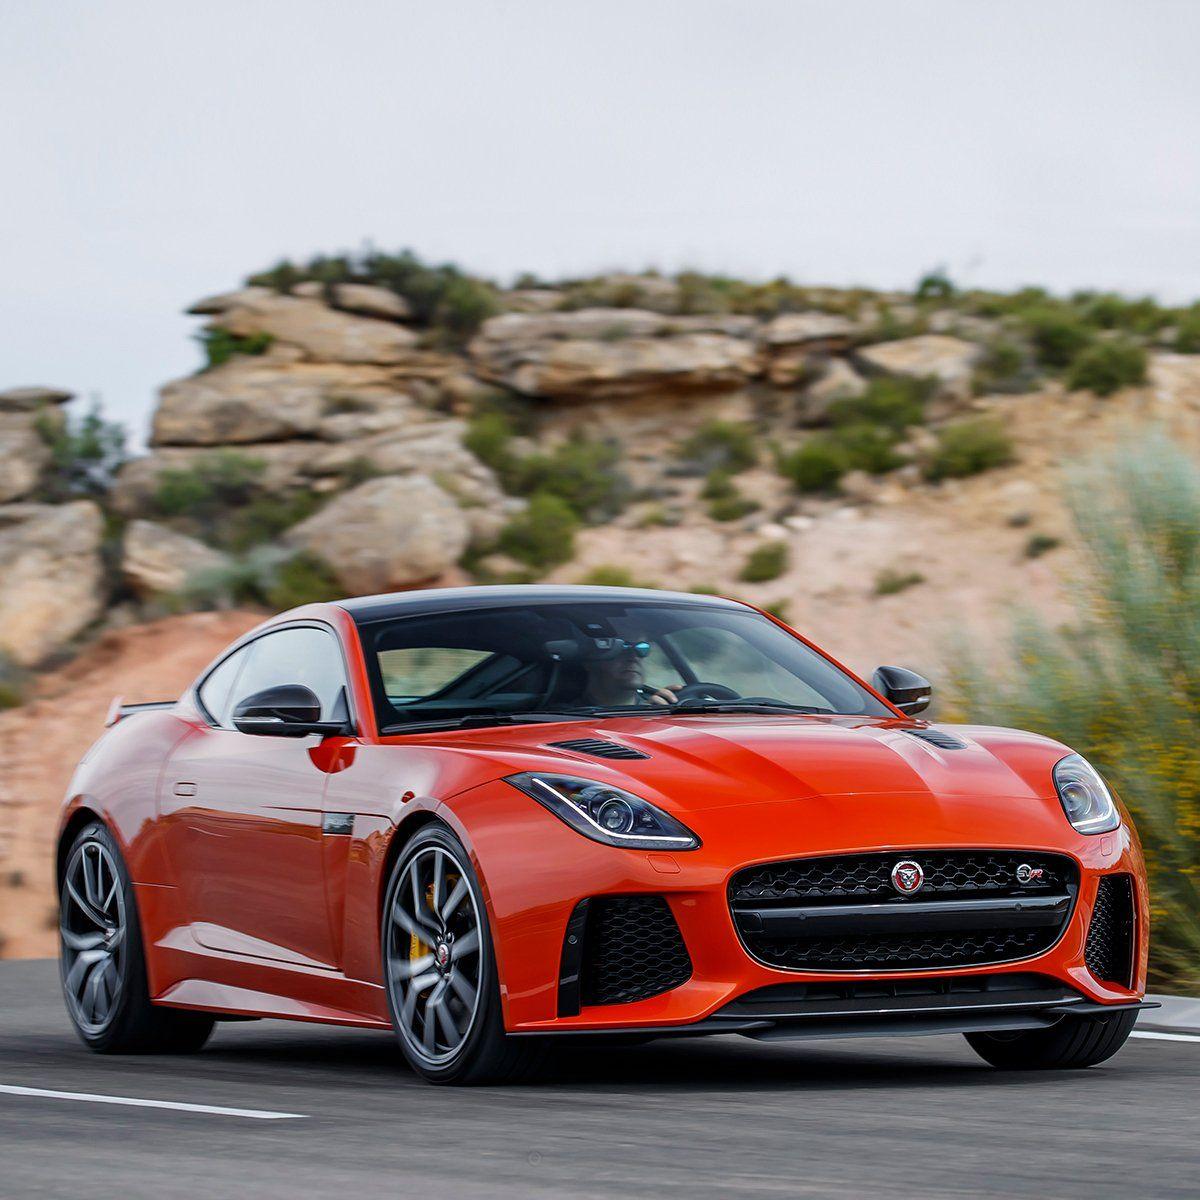 F-Type, a true Jaguar | Jaguar f type, Jaguar, Bmw